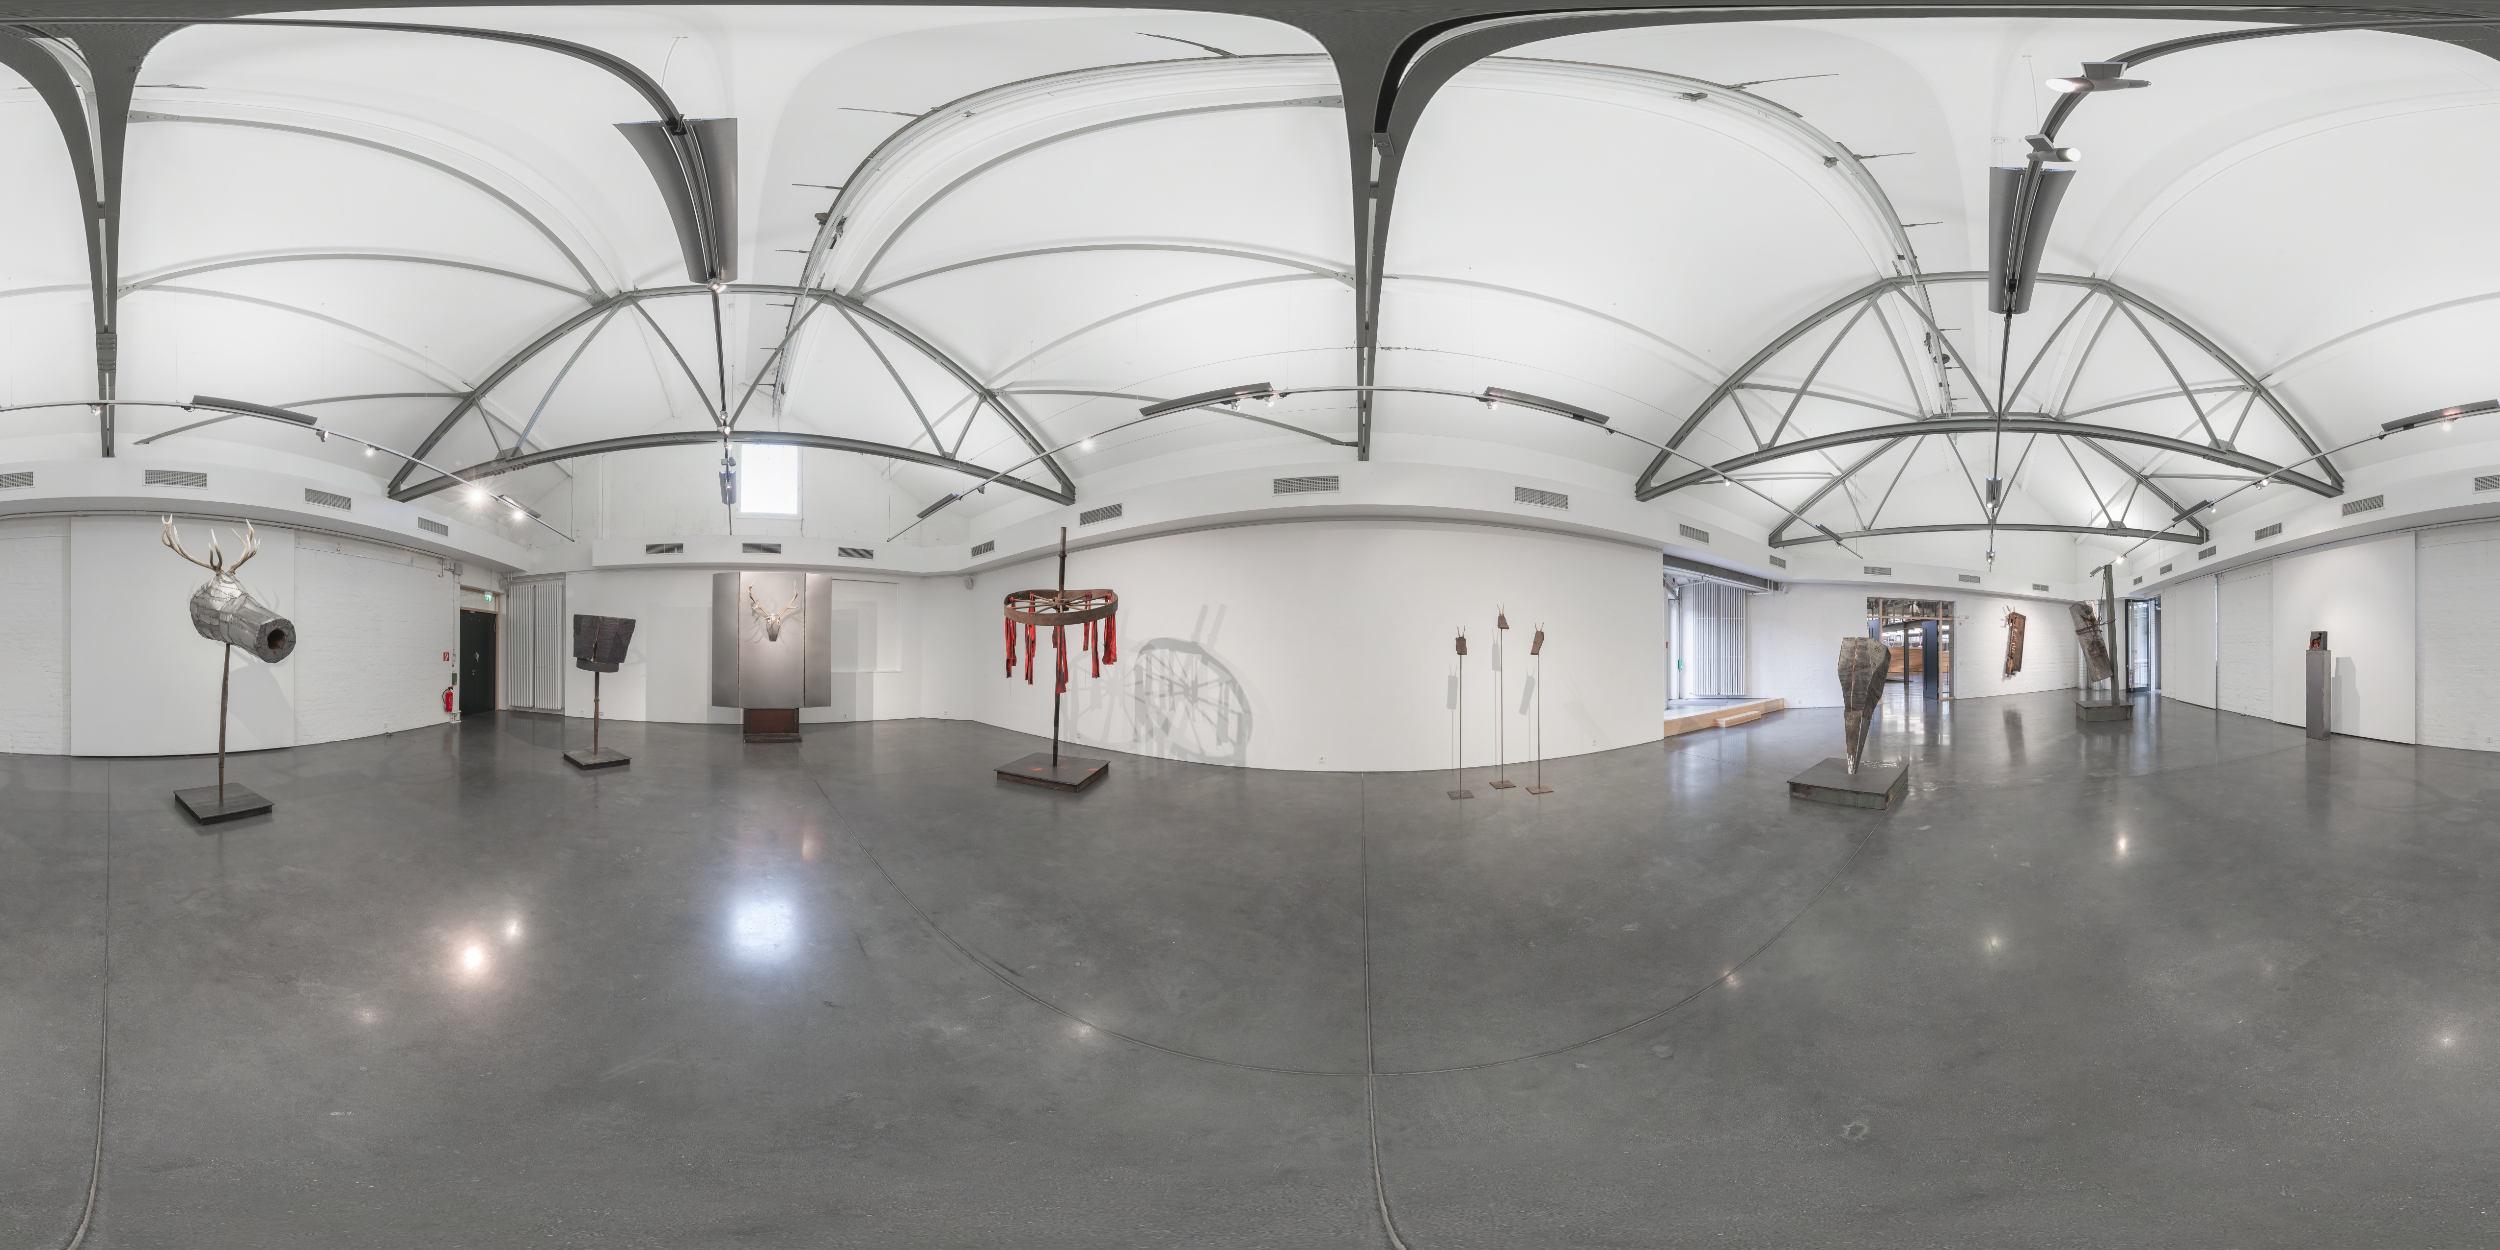 Panoramafotografie Virtuelle Touren 360Grad Fotografie Stuttgart und Umgebung Gigapixel Panorama Technikmuseum Schorndorf 360°x180° Schorndorf Sphäre Museumsrundgang